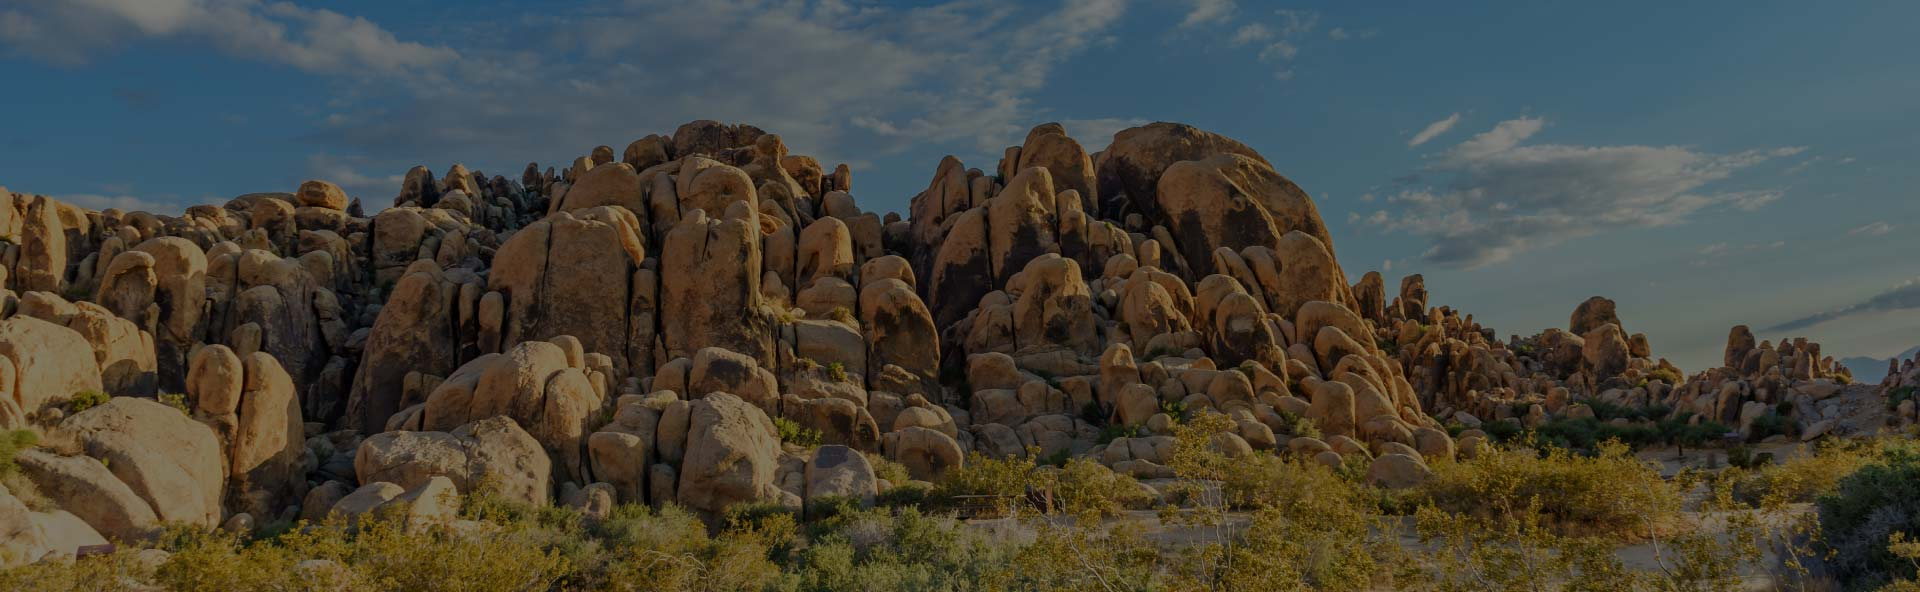 NAHREP High Desert can help YOU build your business